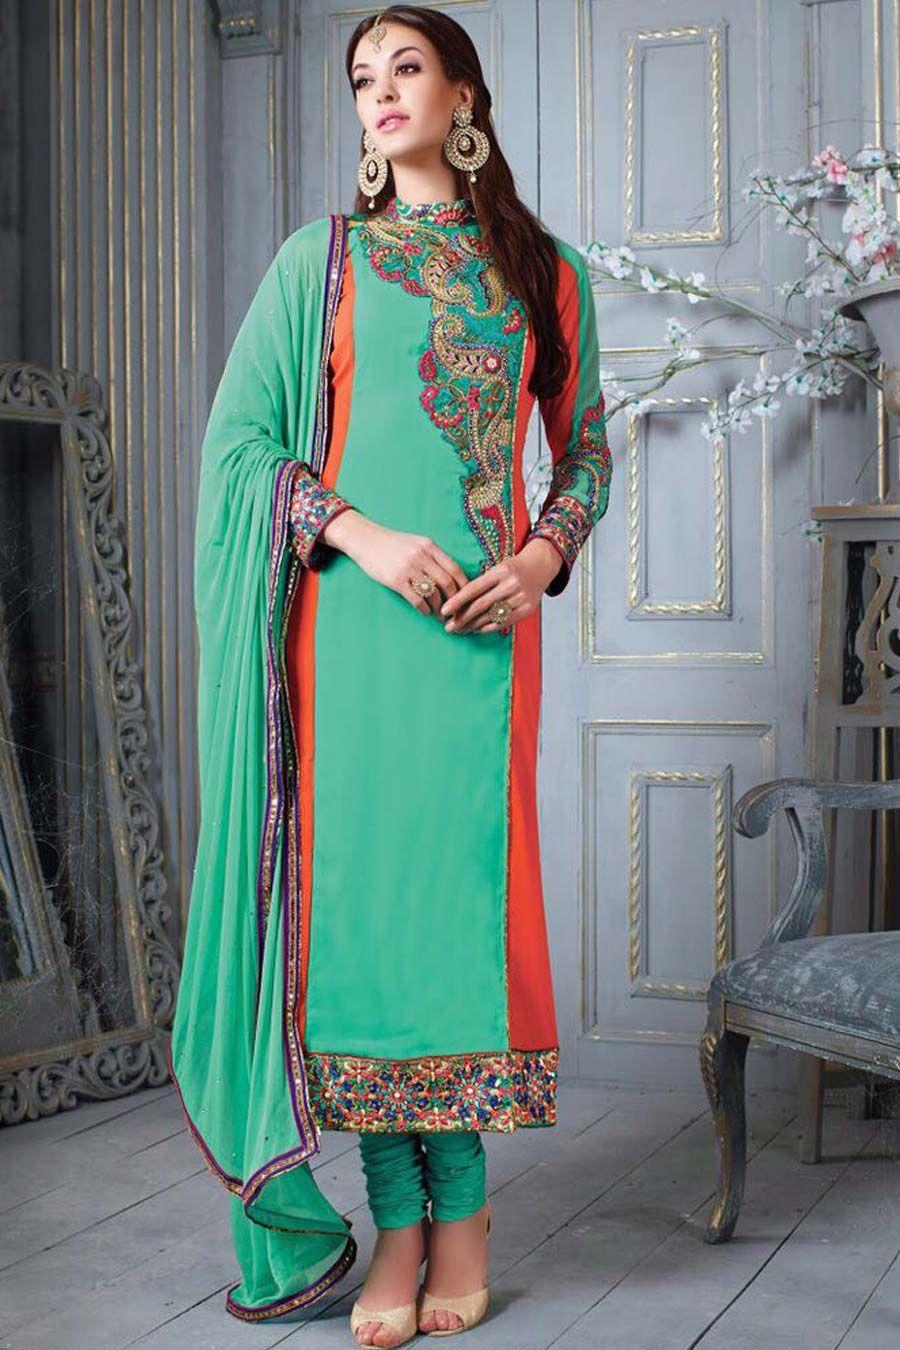 Green Georgette Semi Stitch Wedding Suit | Wedding Suits | Pinterest ...